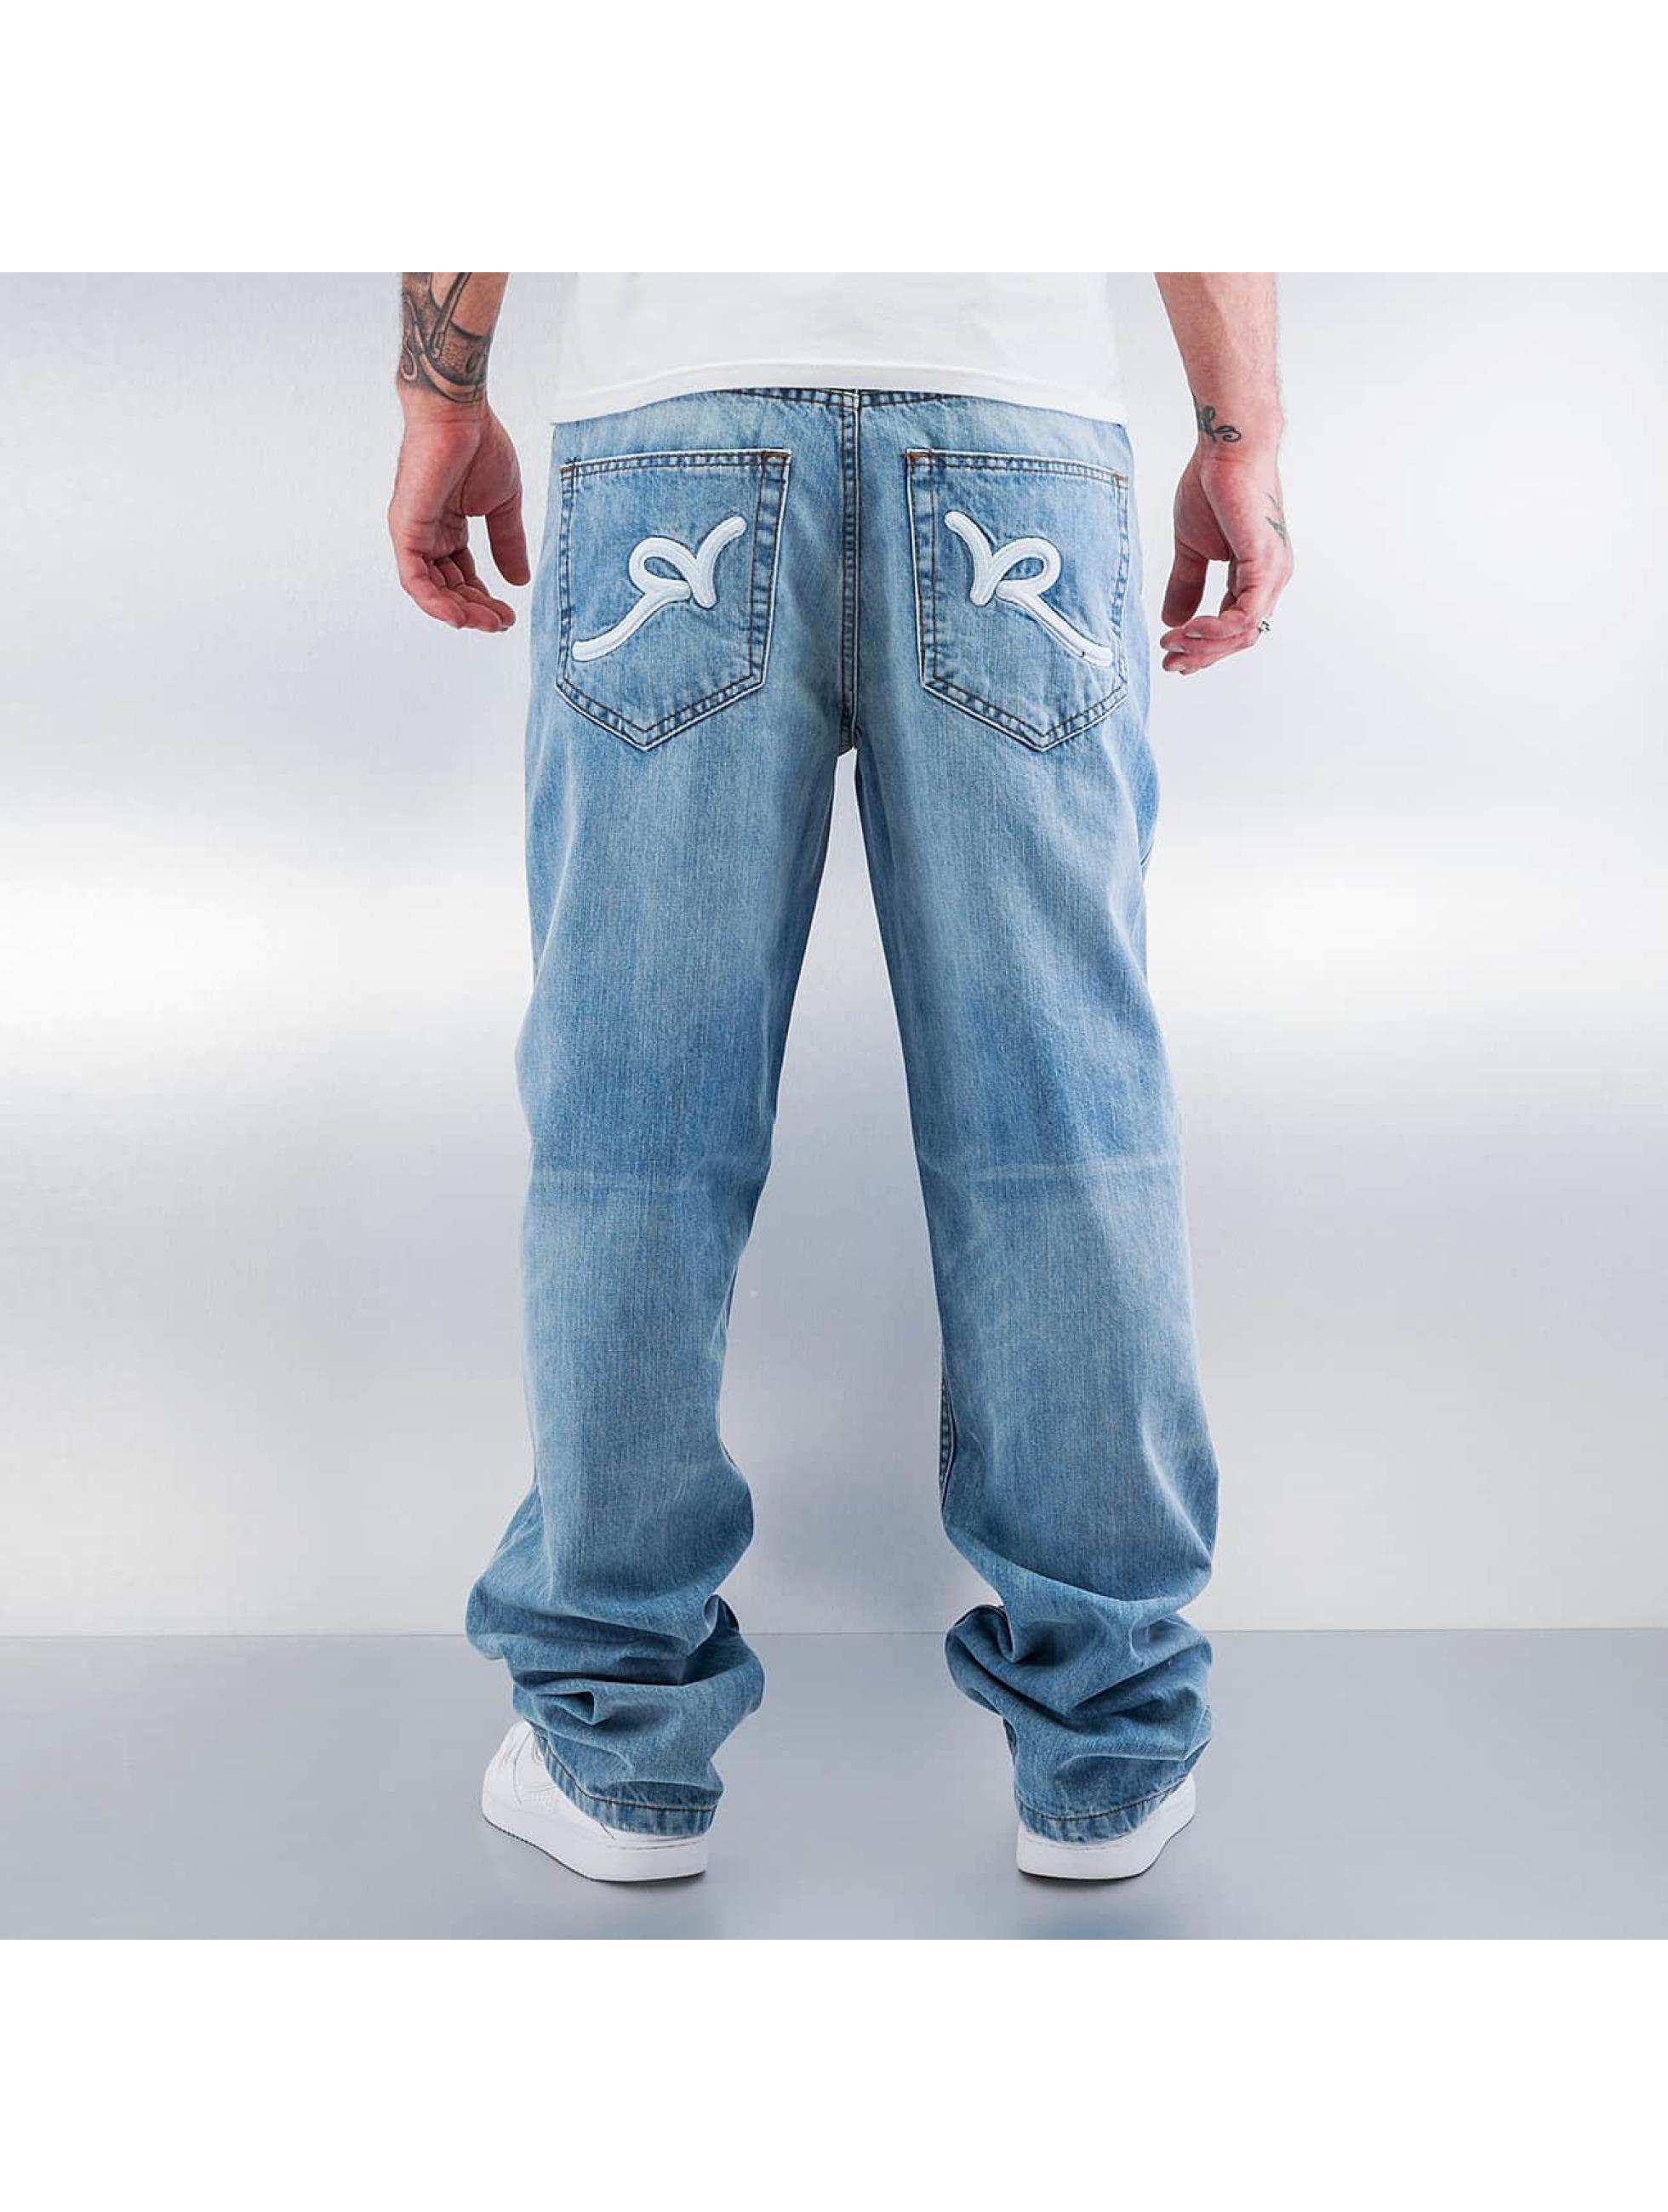 rocawear tap bleu homme jean large rocawear acheter pas cher jean 270726. Black Bedroom Furniture Sets. Home Design Ideas